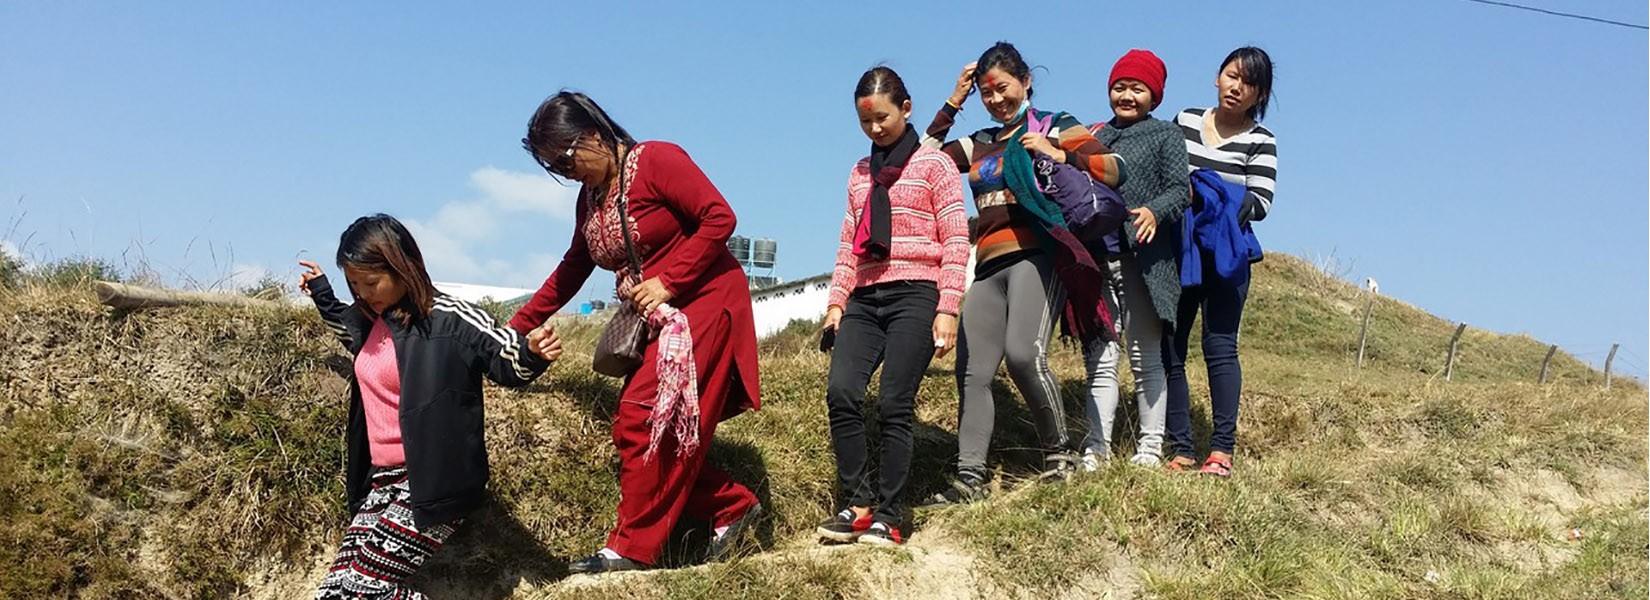 Nepal Famous Scenic Hill Tour